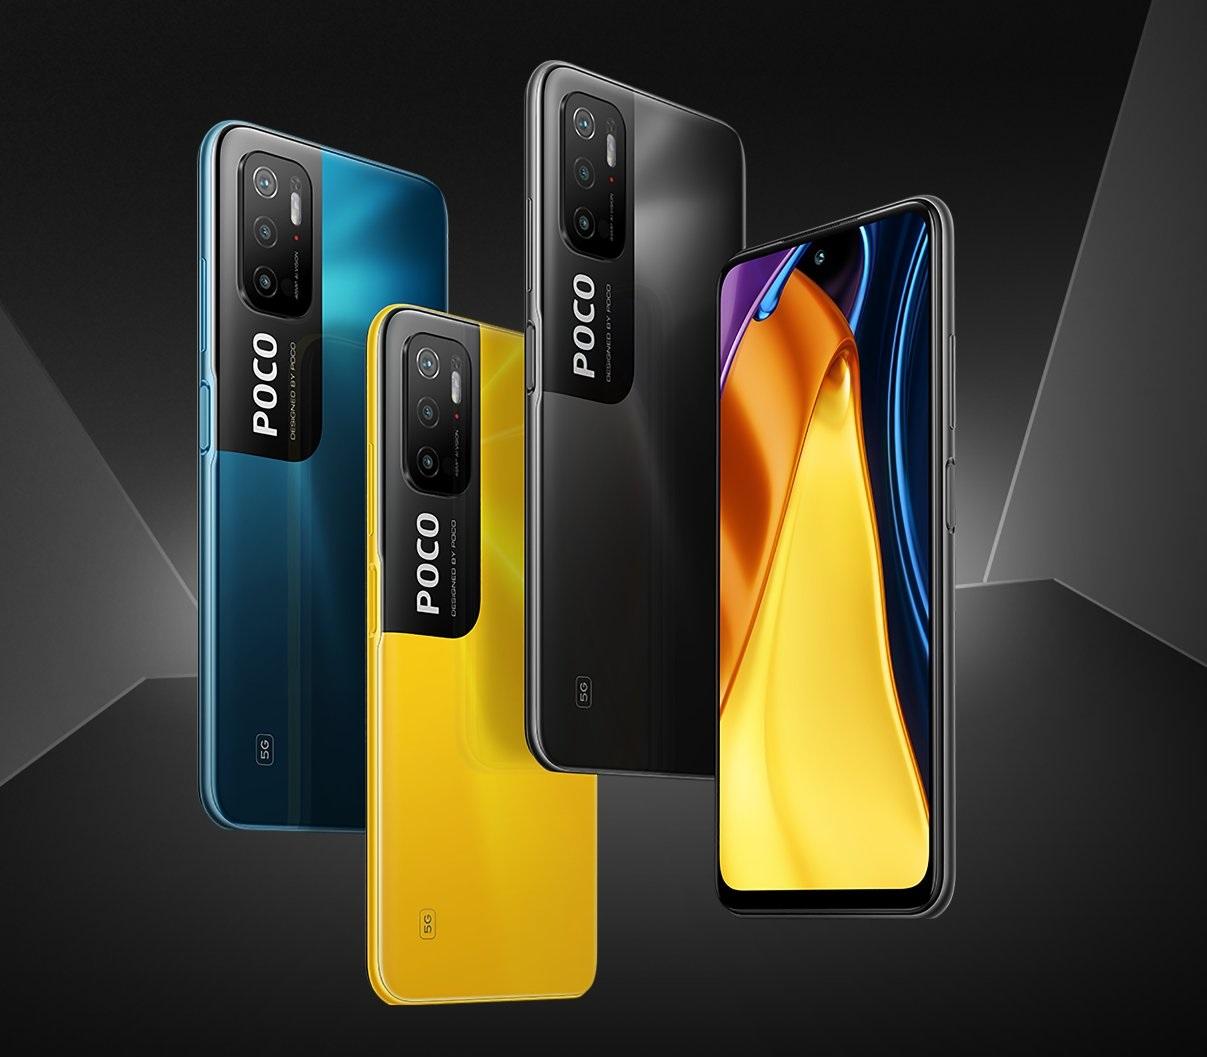 POCO M3 Pro 5G, POCO M3 Pro 5G the Best Camera Picture POCO M3 Pro 5G Screen Guide, POCO M3 Pro 5G testing, POCO M3 Pro 5G replacement